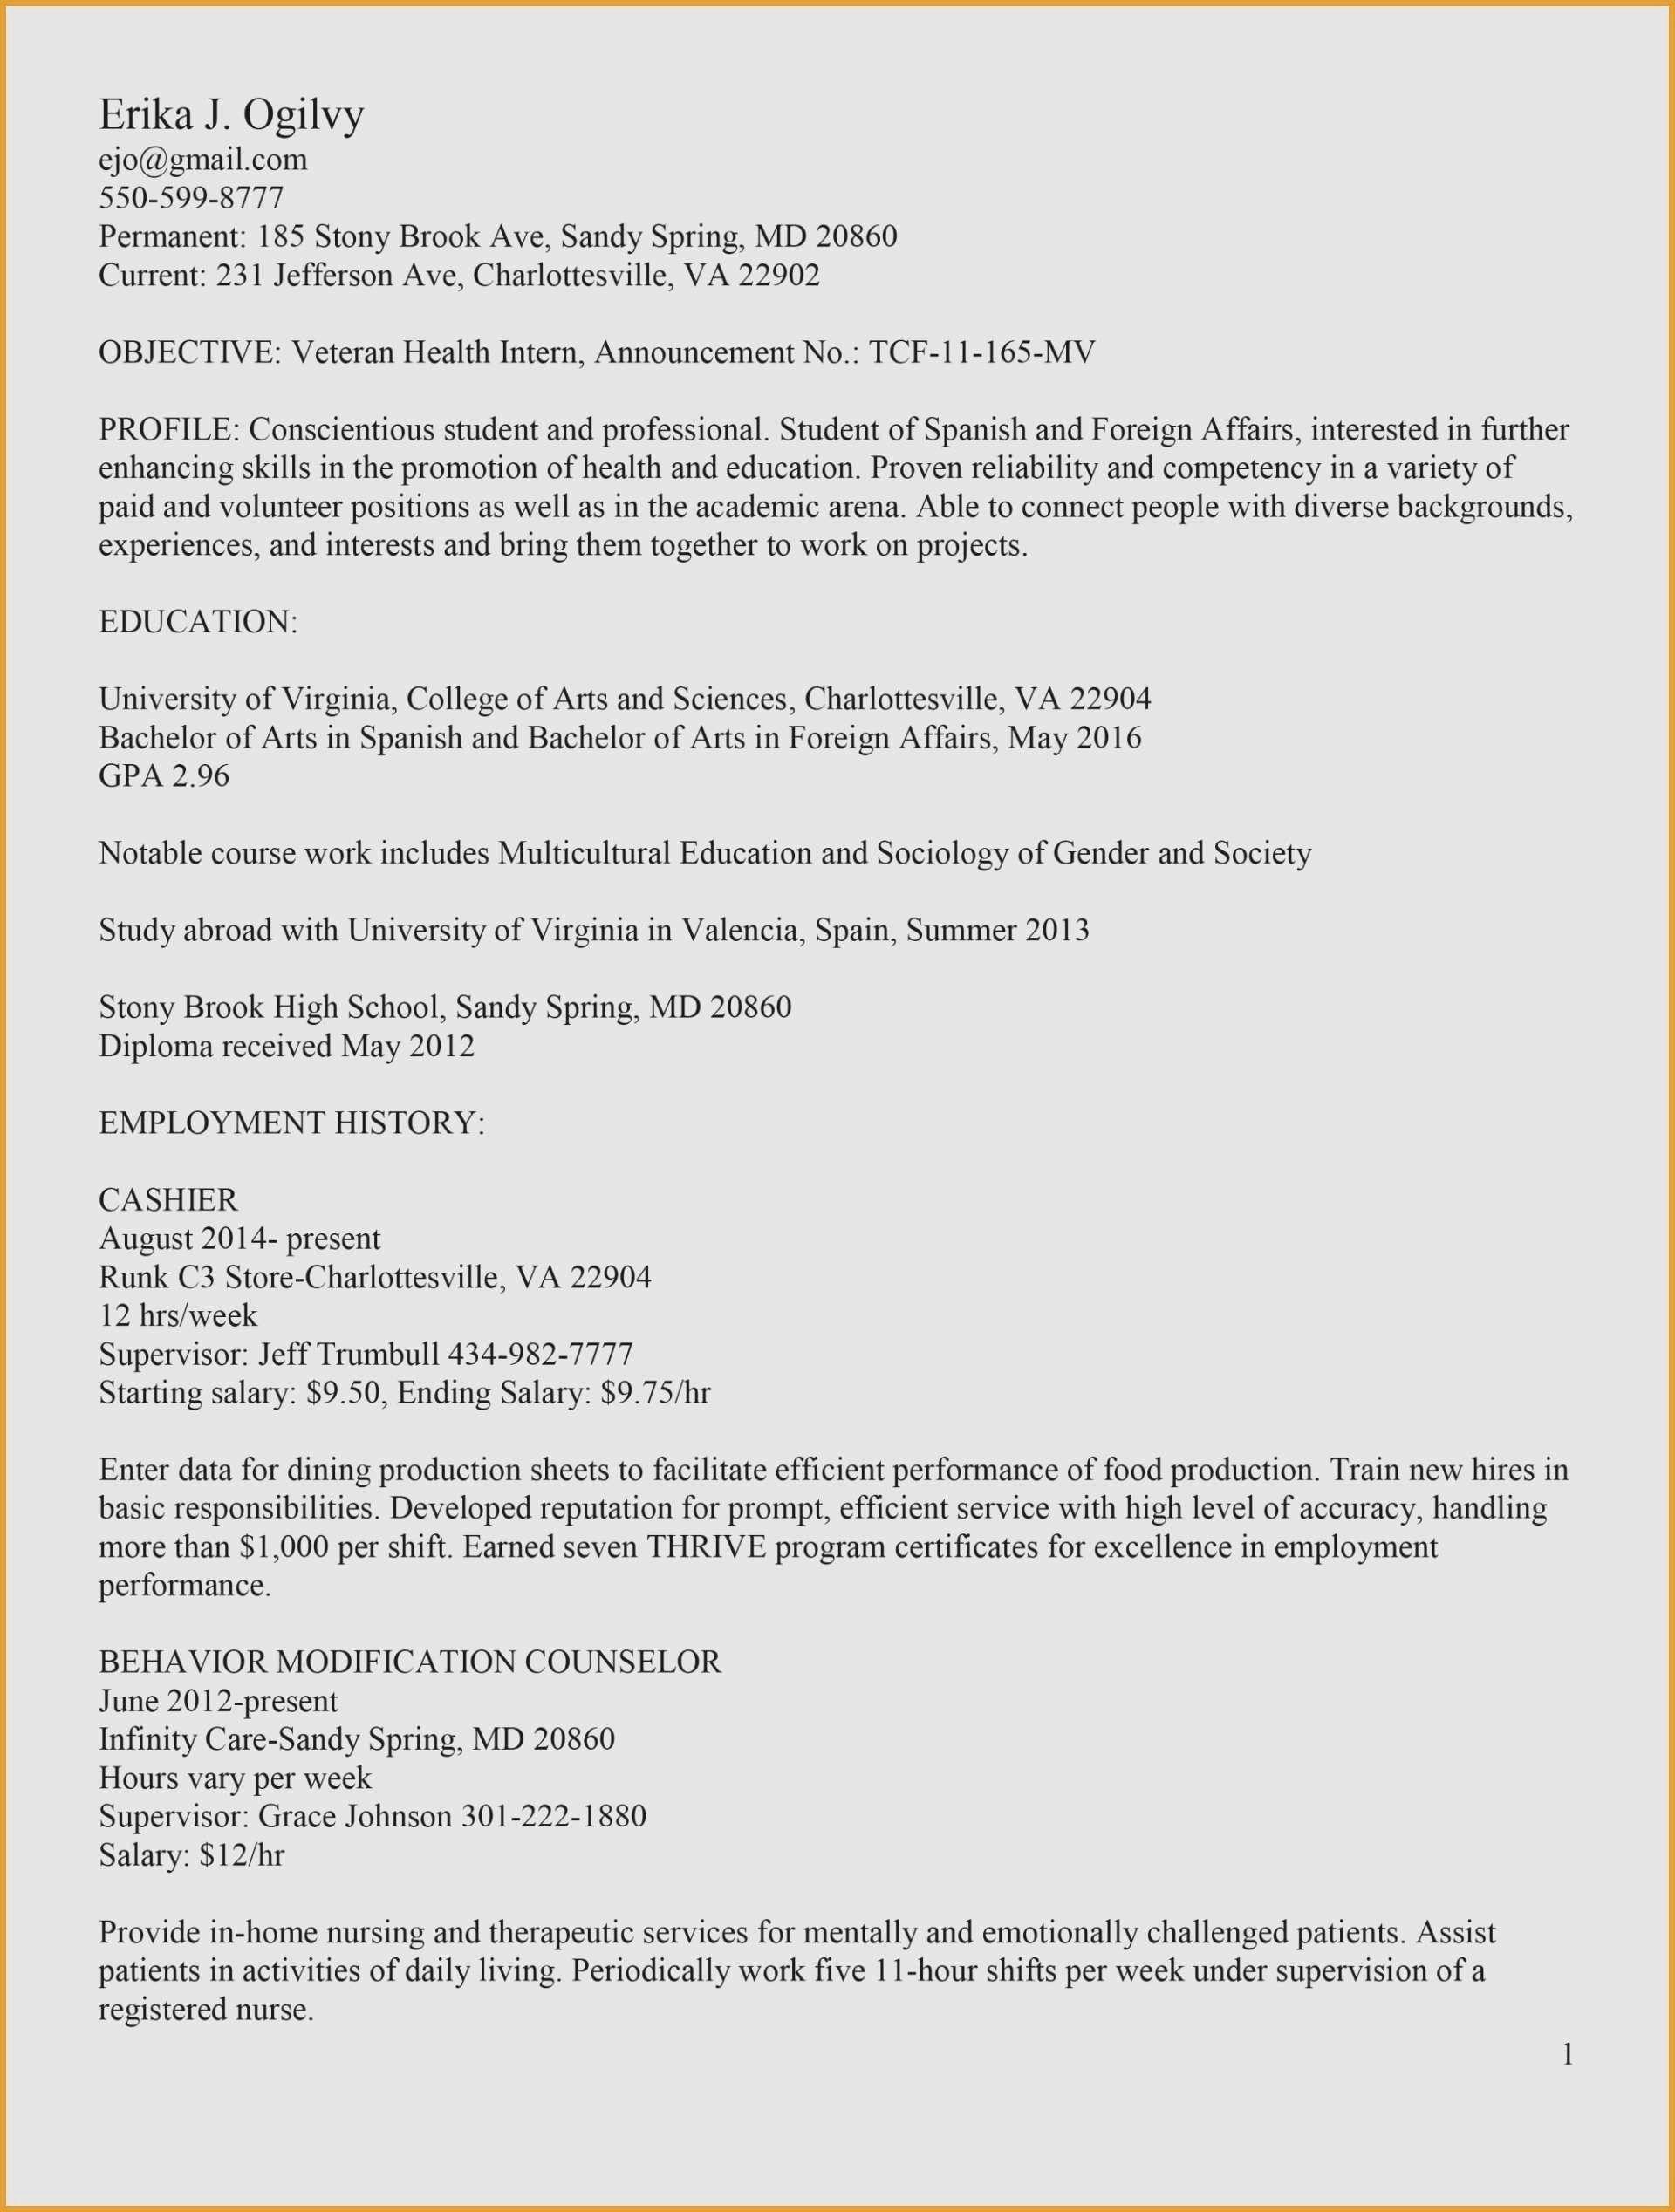 Functional Resume Template Google Docs Free